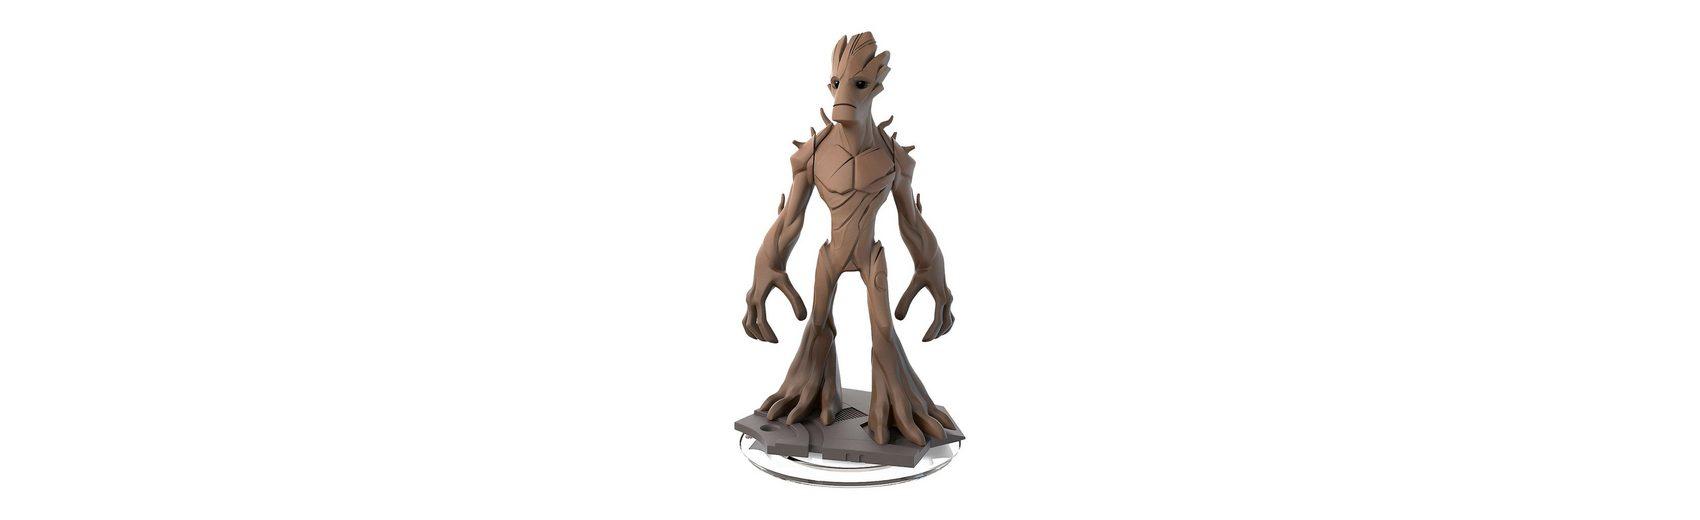 ak tronic Disney Infinity 2.0: Einzelfigur Groot